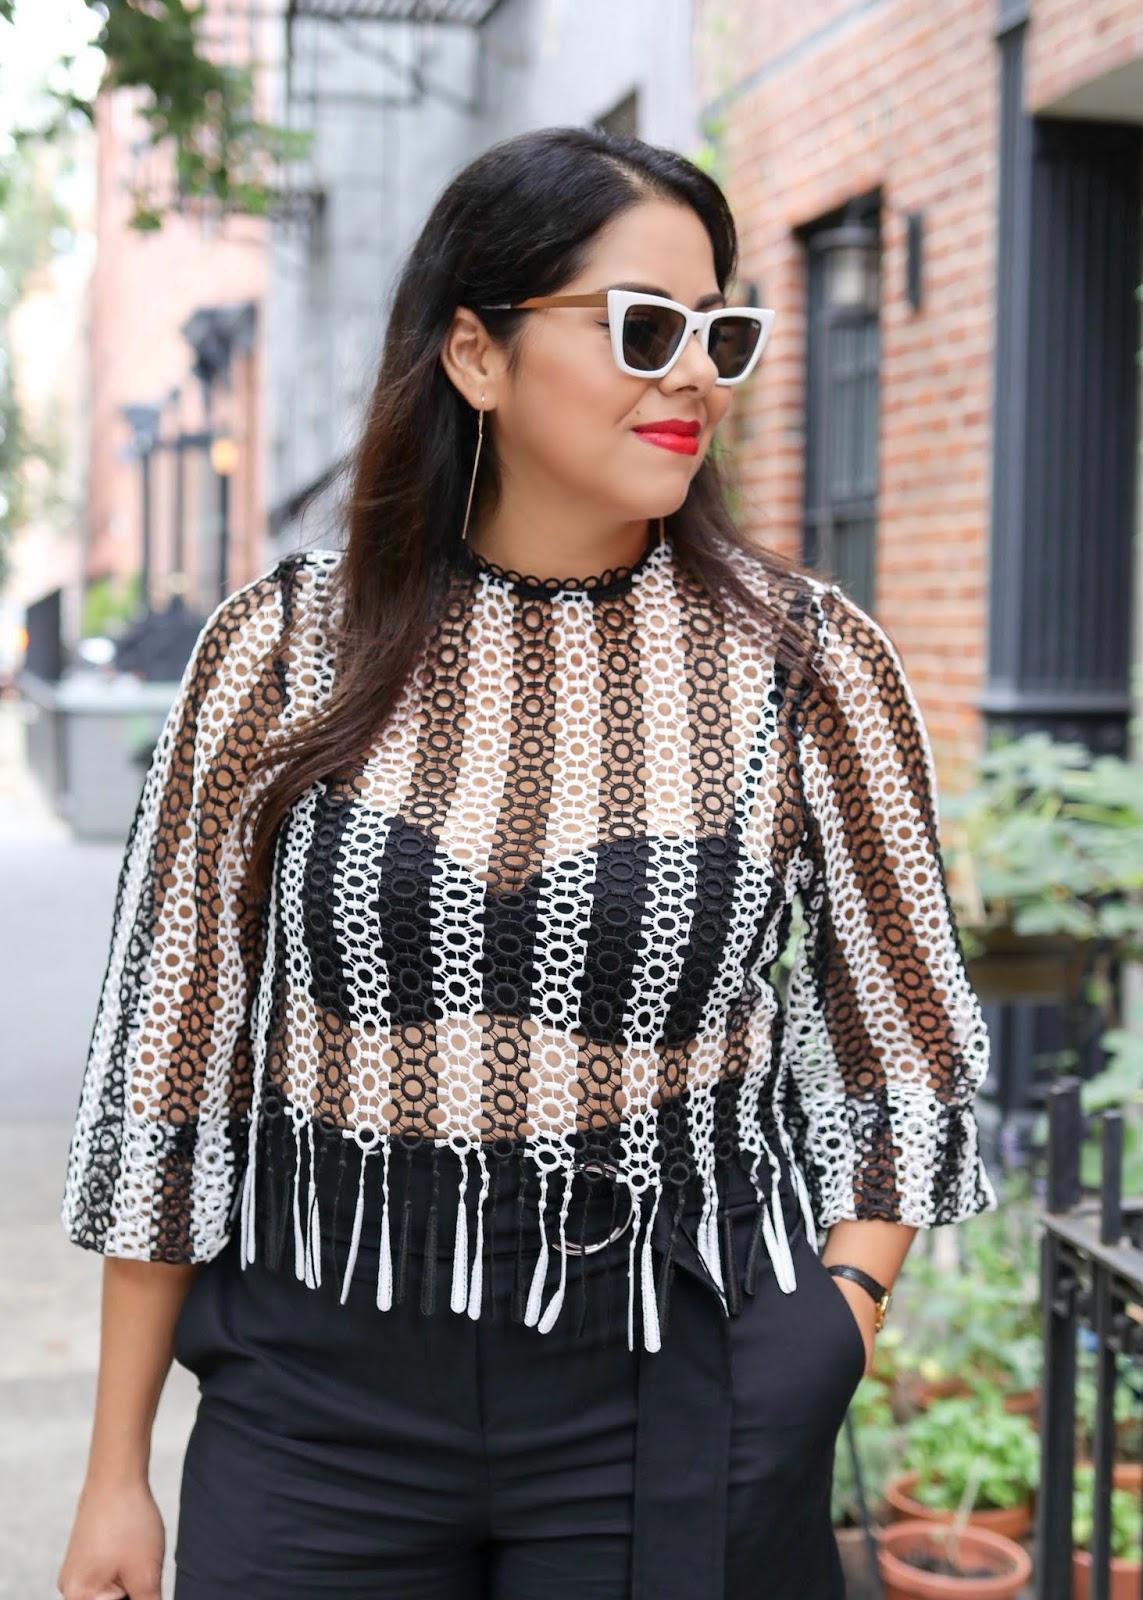 Quay white sunglasses, top shop black and white crochet top, statement sunglasses